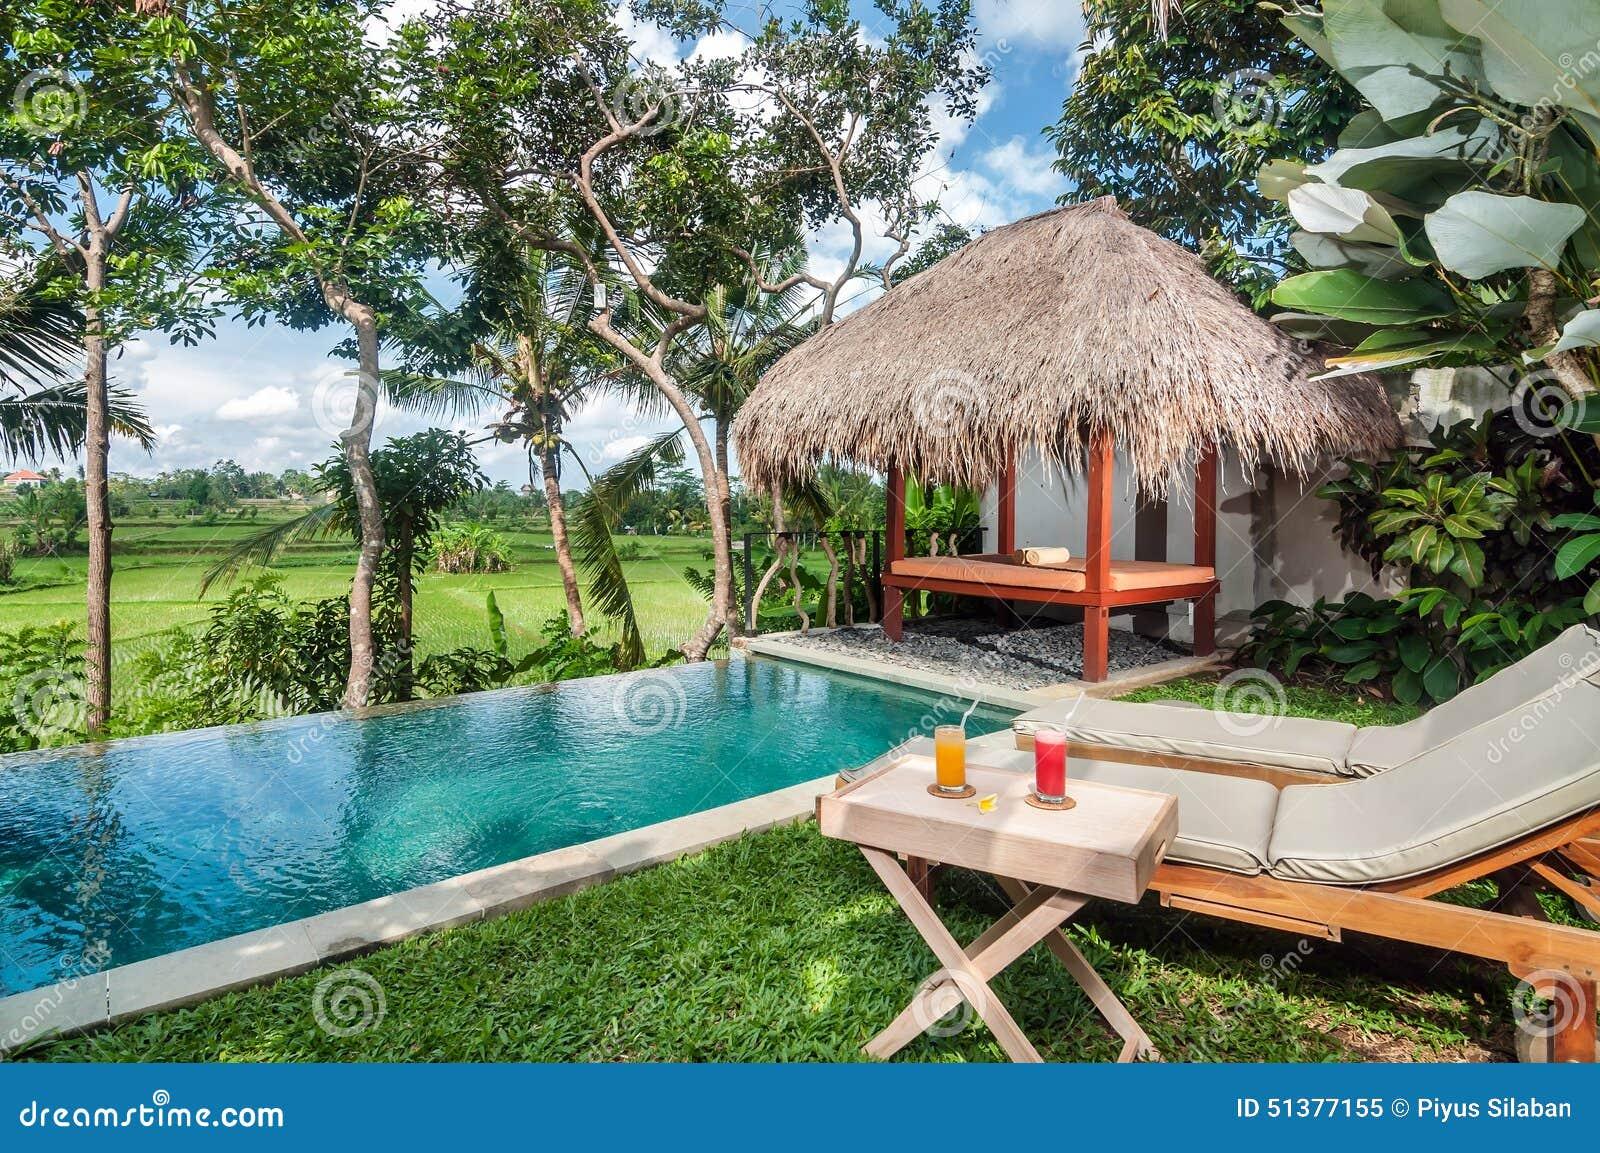 Outdoor Pool Area Of Luxury Bali Villa Stock Image Image Of Grass Leisure 51377155